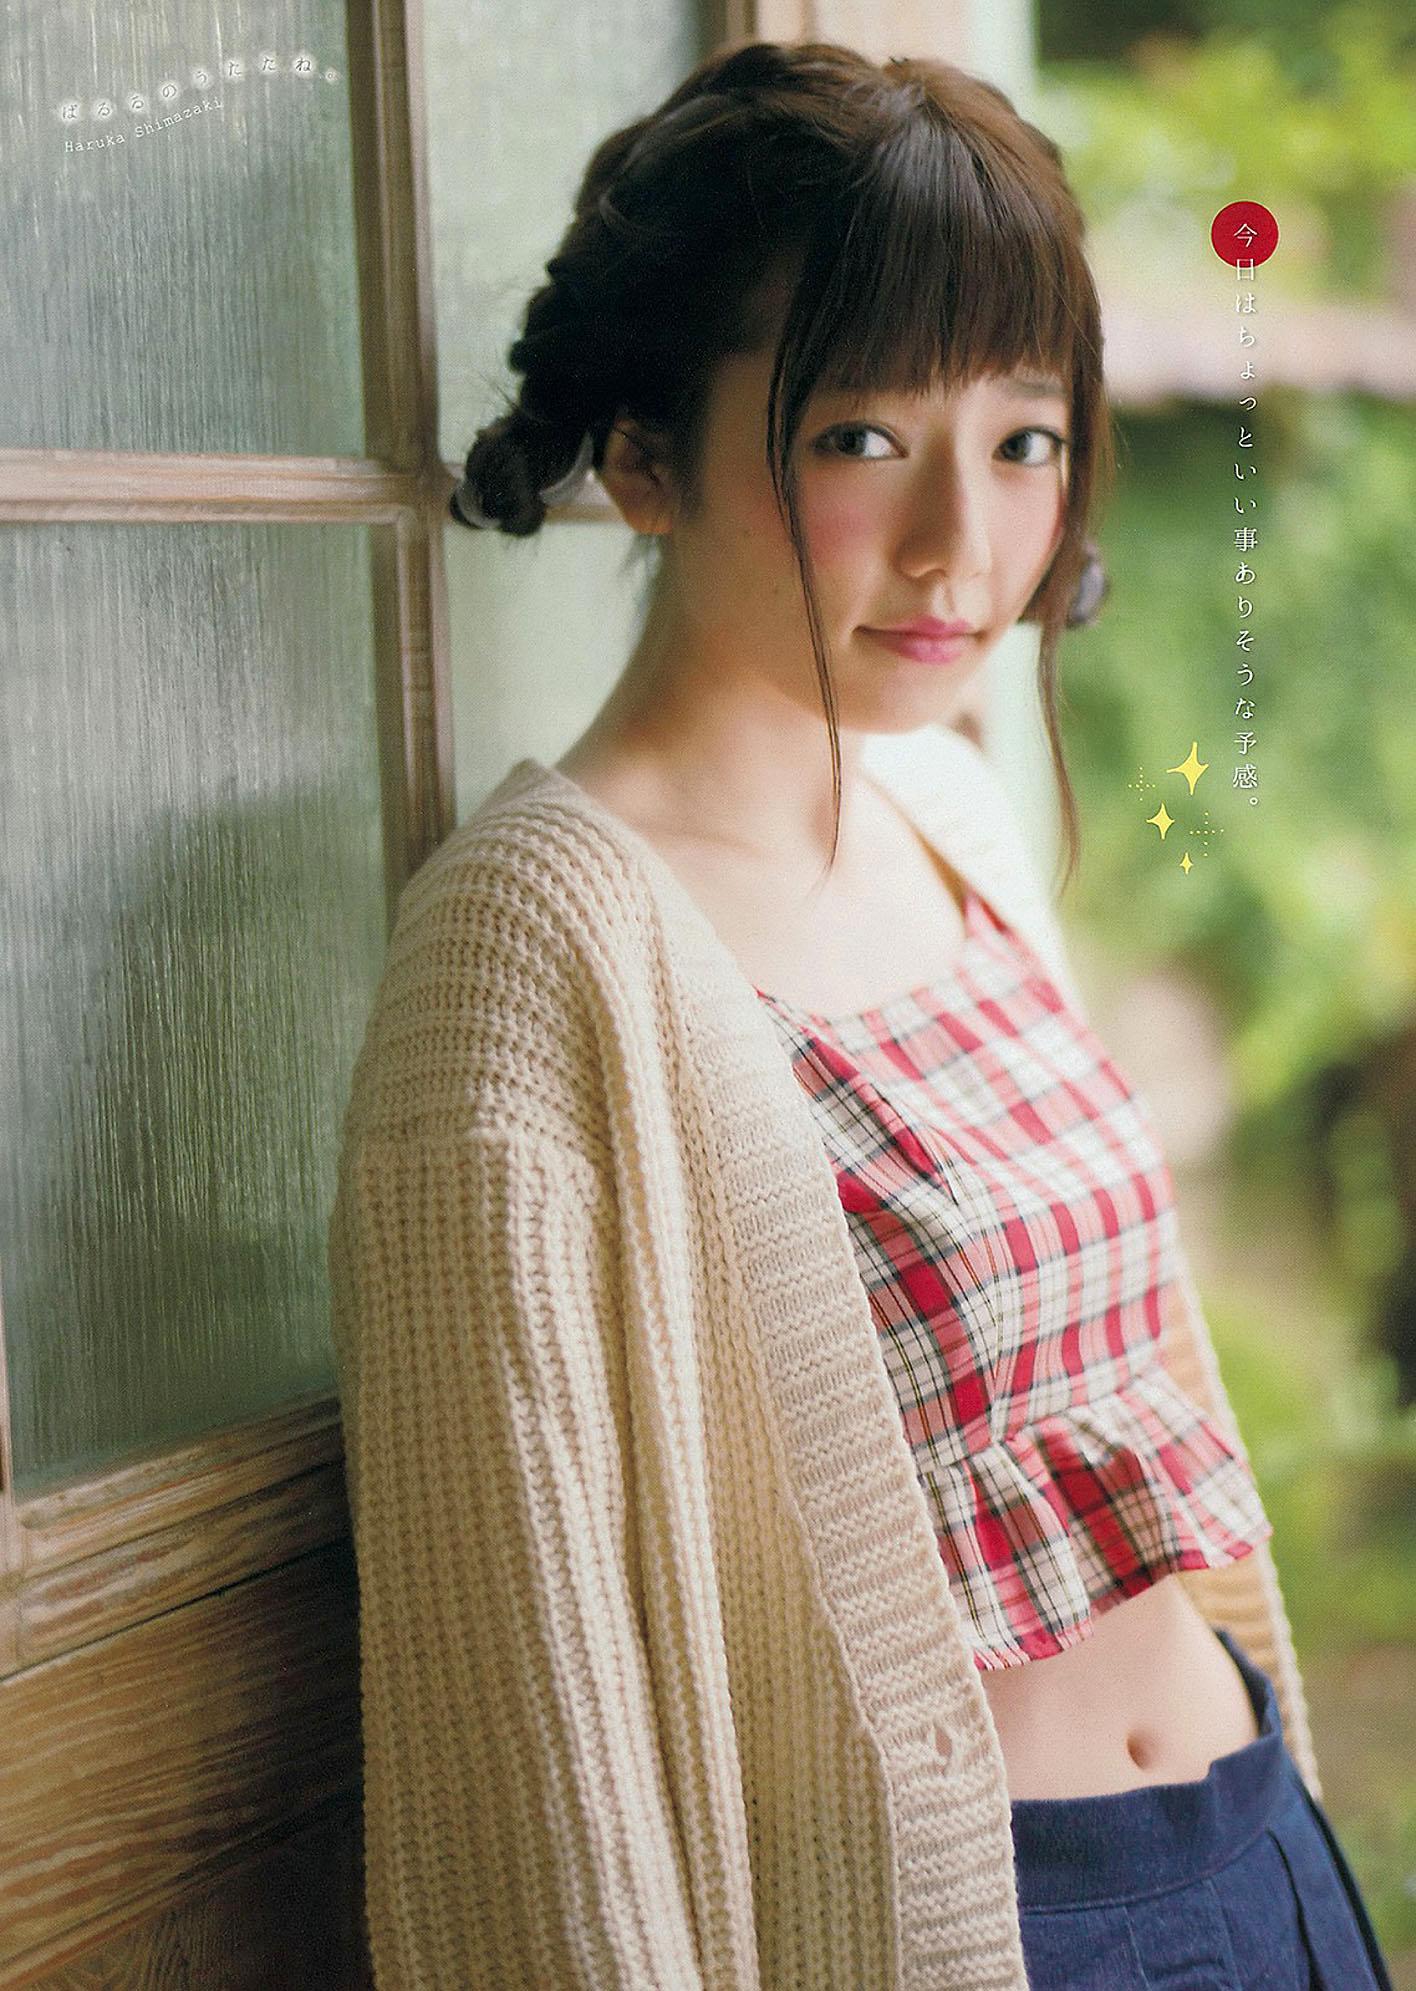 HShimazaki Young Magazine 141201 04.jpg